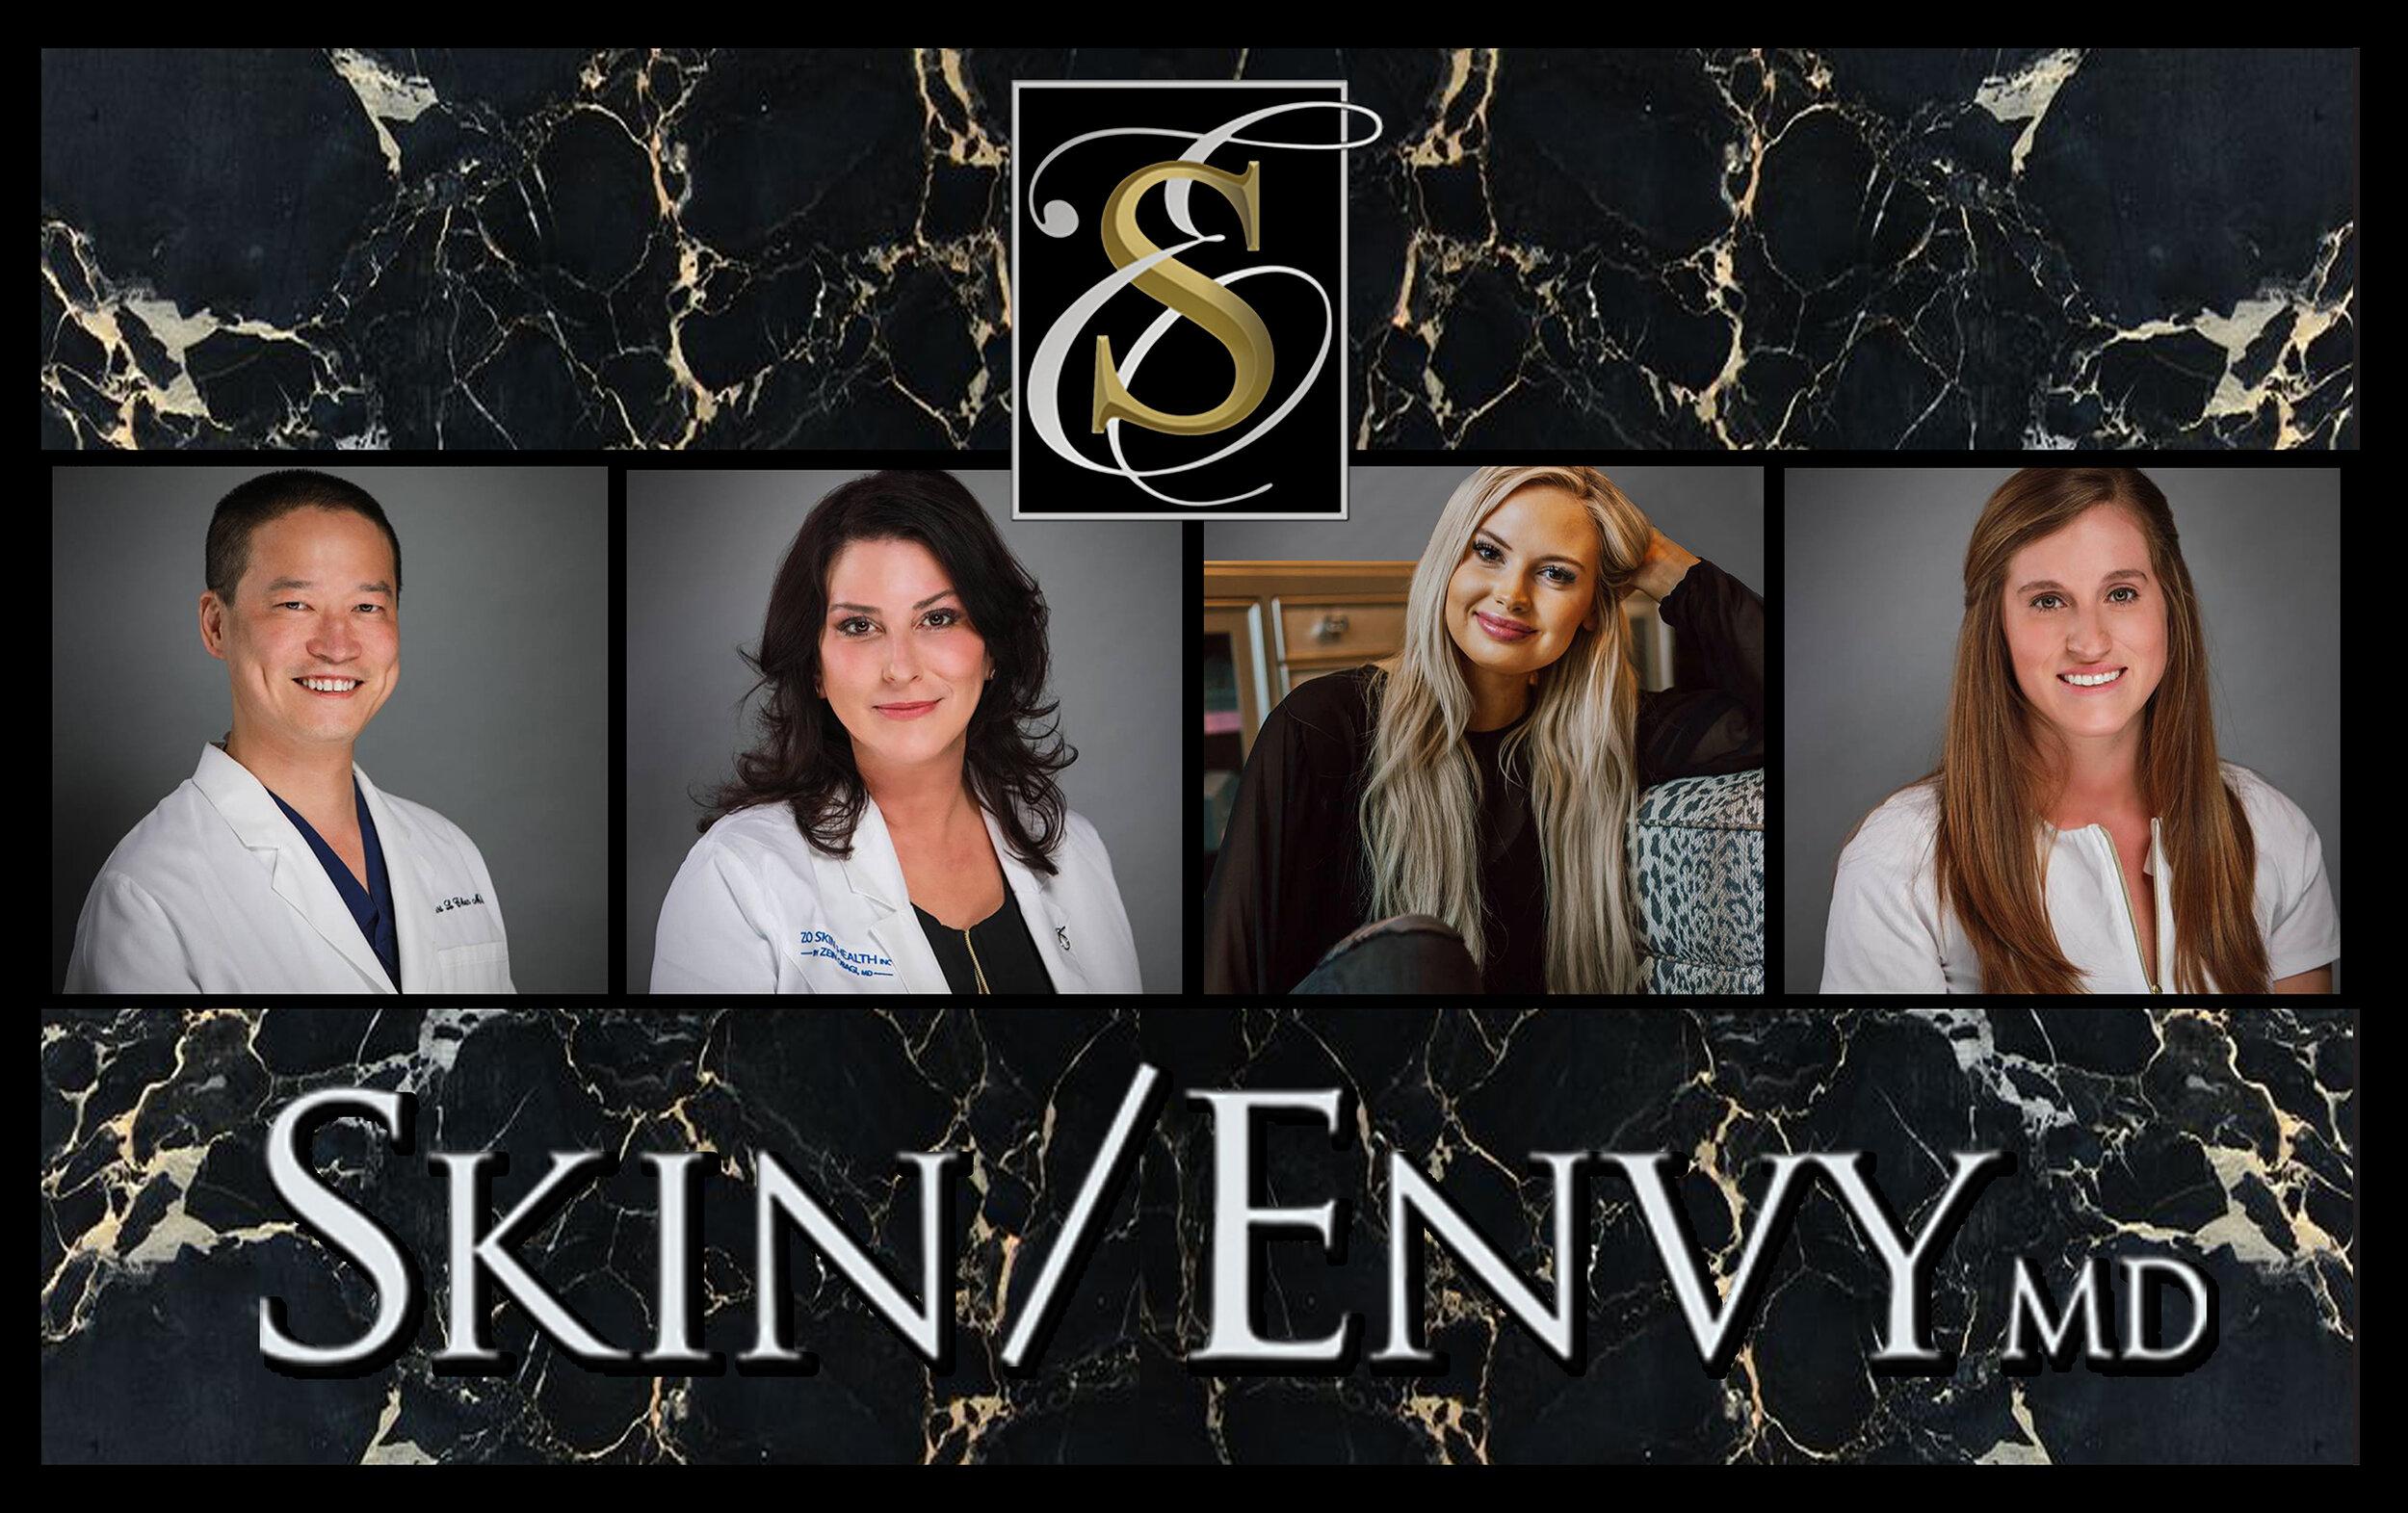 Skin/Envy MD - we are: Dr. Robert Chen, Jennifer Misuraca, RN, McKenzie Burris, LE & Lizzy Wester